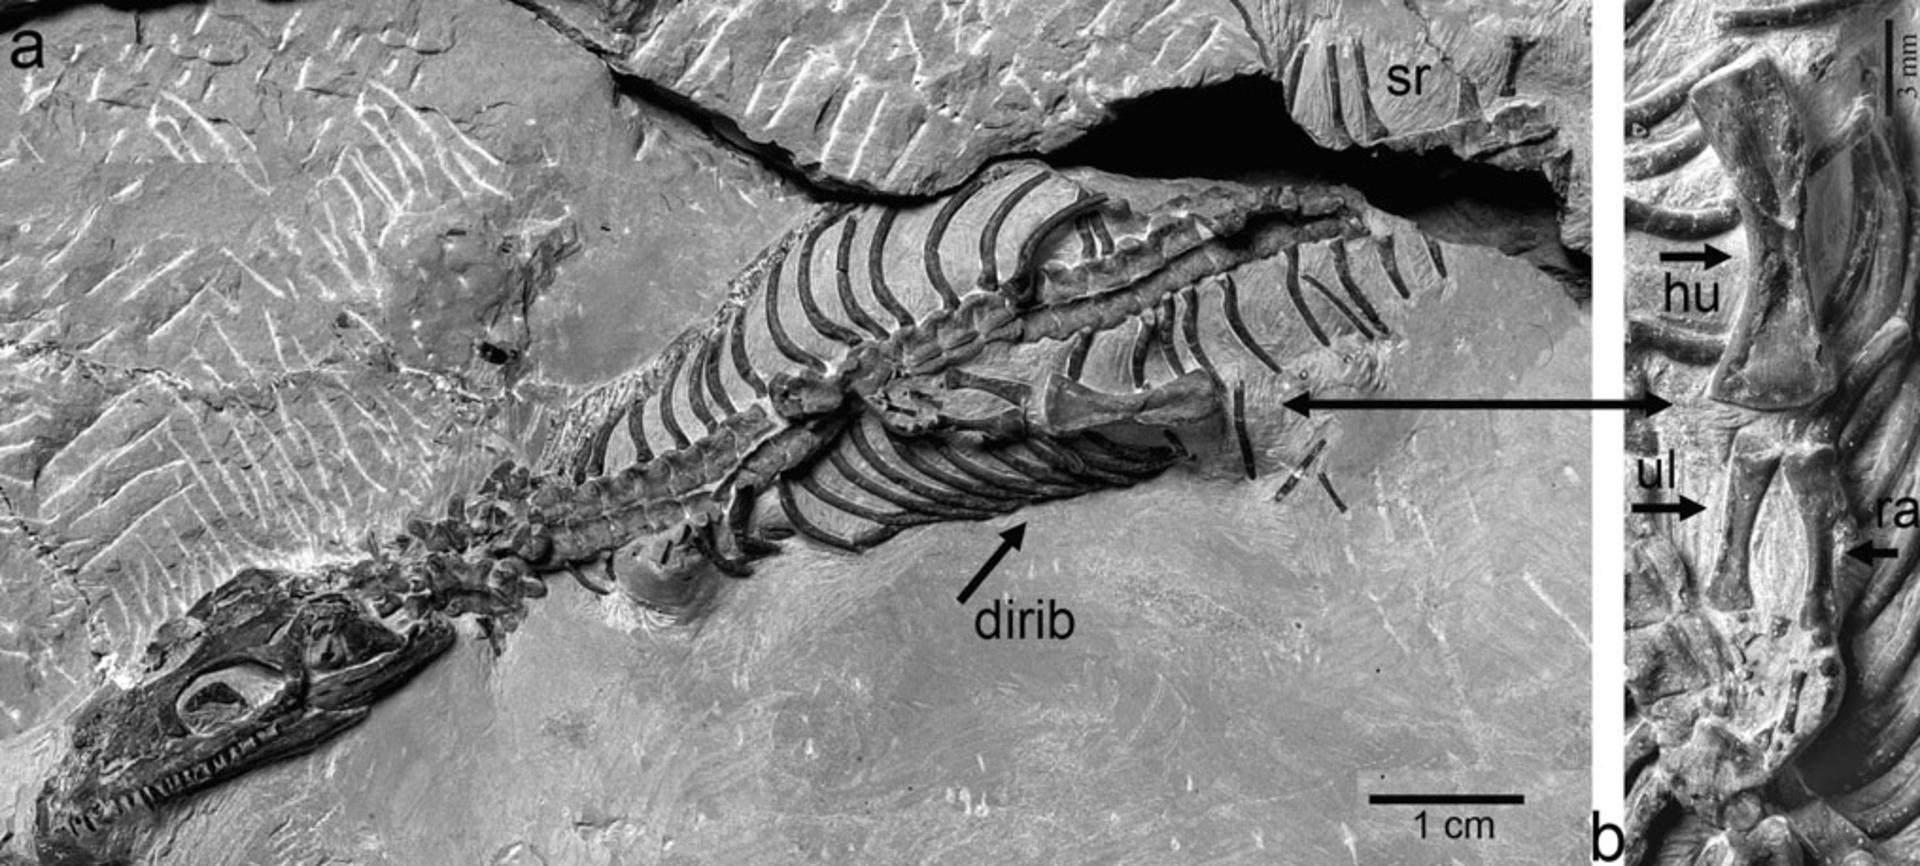 RGM.443858 | Anarosaurus heterodontus Rieppel & Lin, 1995